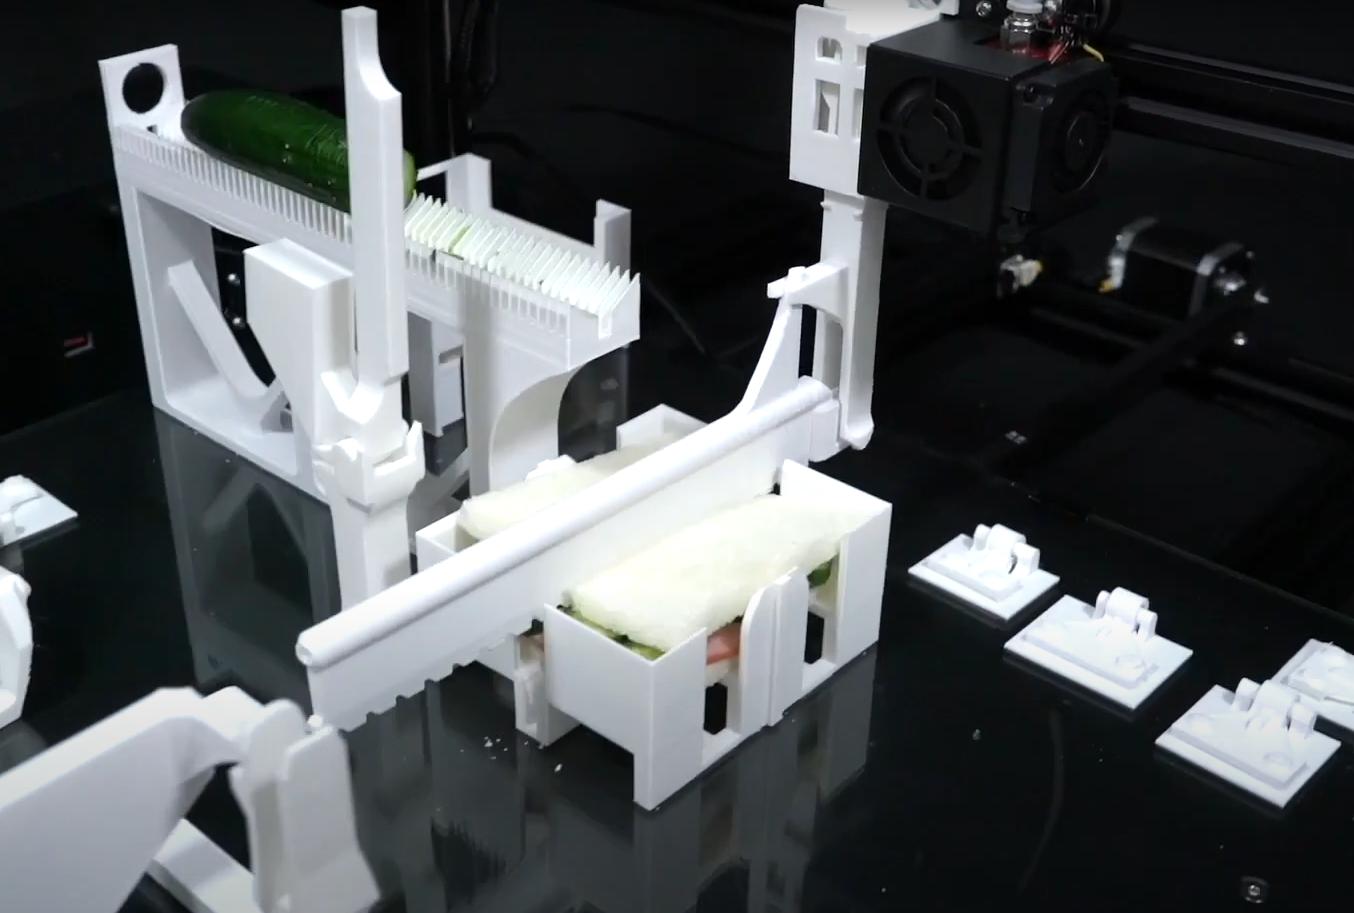 A 3D printer makes a sandwich